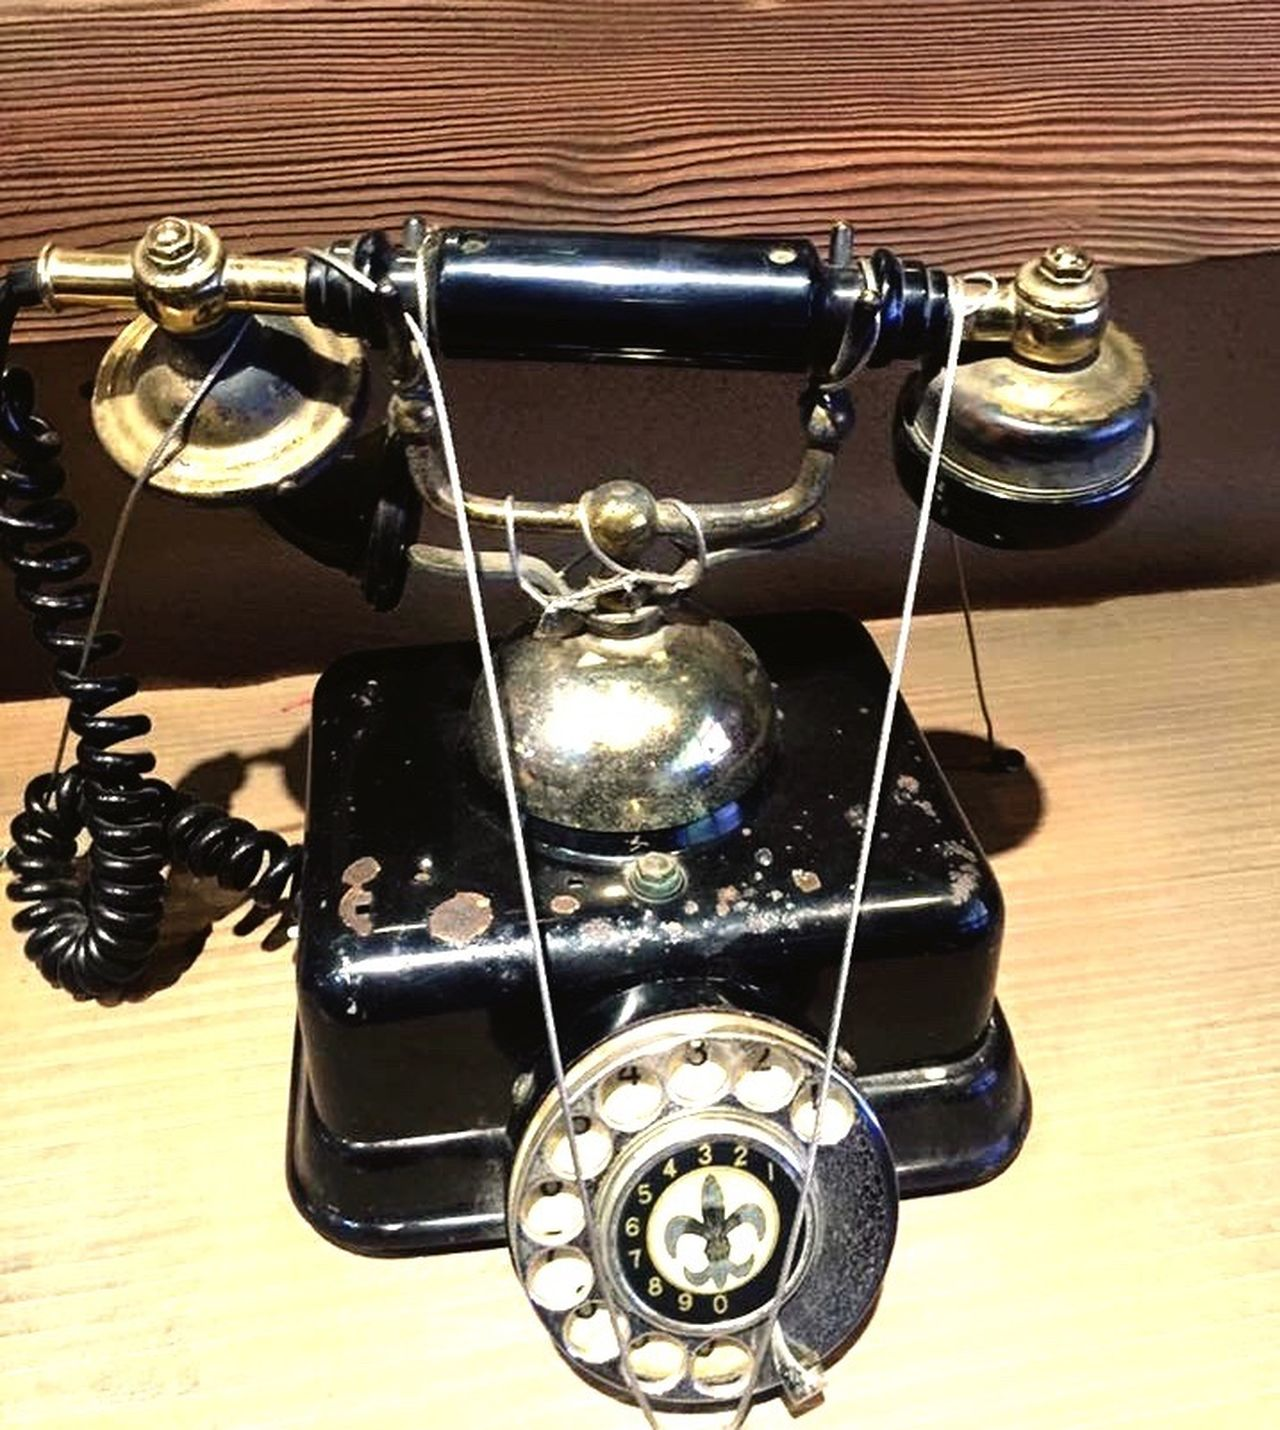 Old Phone Old Phone Photo Telephone Old Telephone Korea EyeEm Gallery EyeEm Eyeem Market Eyeemphotography Old-fashioned Oldschool Old Technology Everland EverlandKorea Everlandthemepark Everland, Korea